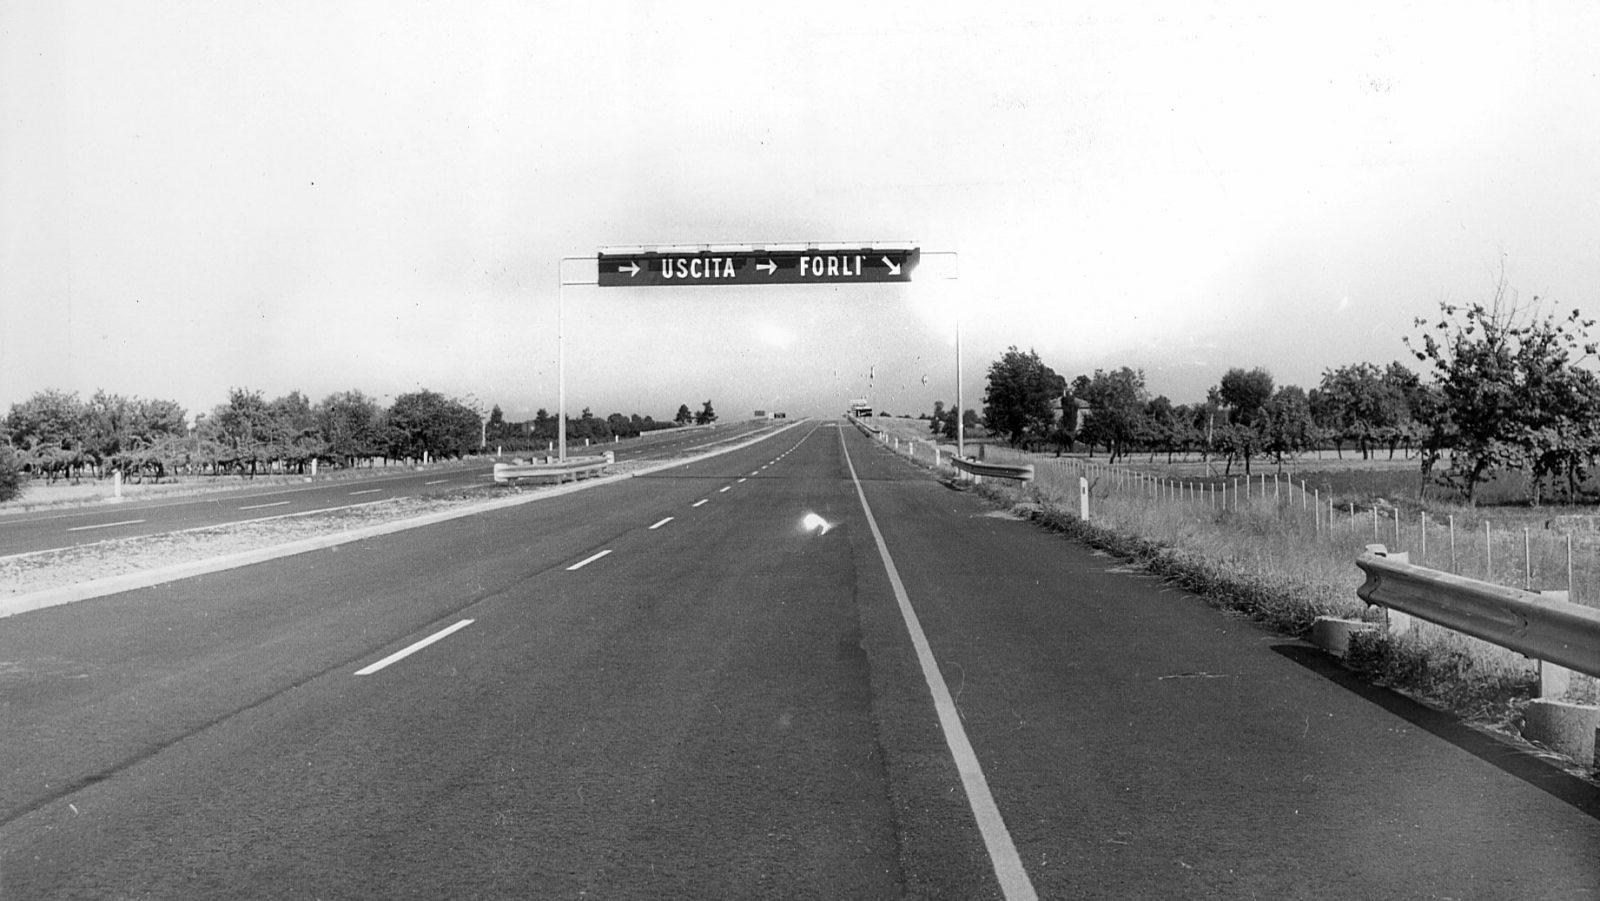 Emilia Romagna, autostrada A14 Bologna-Canosa, uscita di Forlì (Archivio storico Anas)